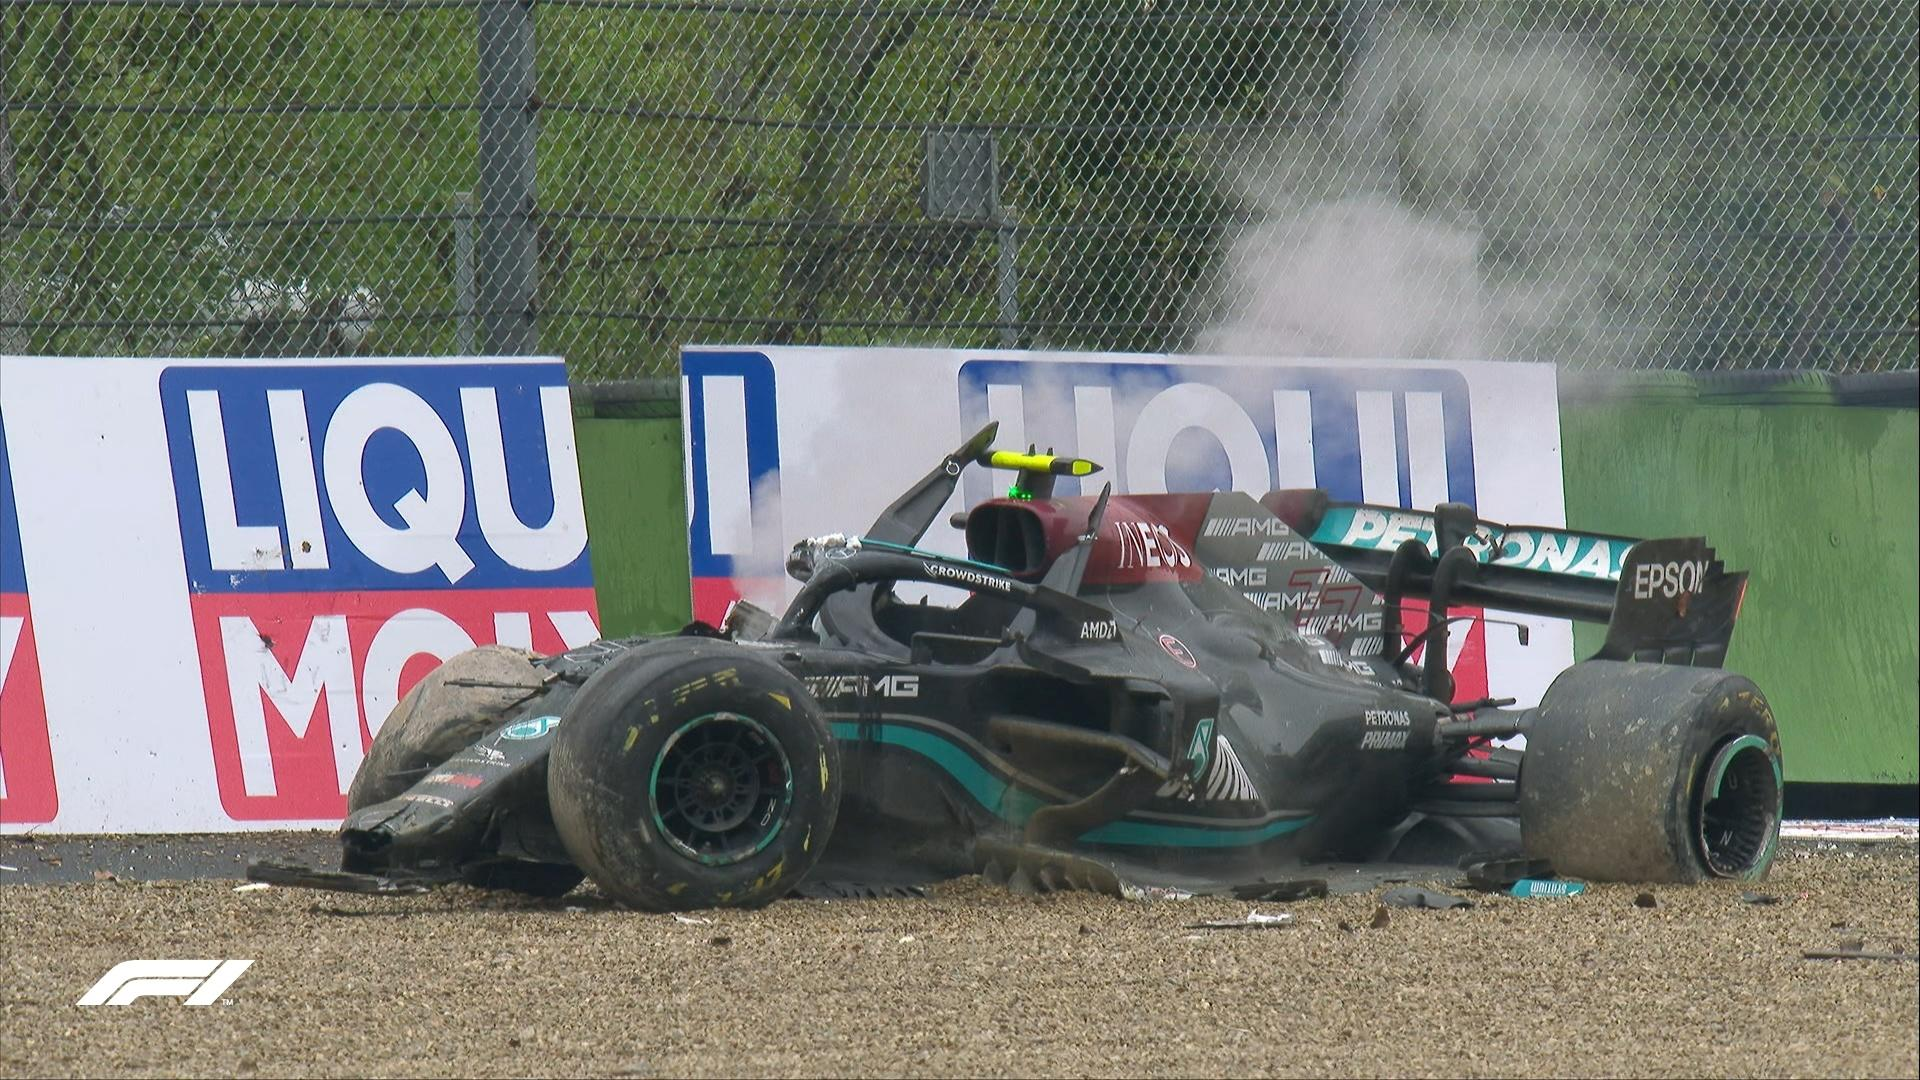 GP Emilia Romagna F1/Imola: O acidente de Valtteri Bottas/George Russell